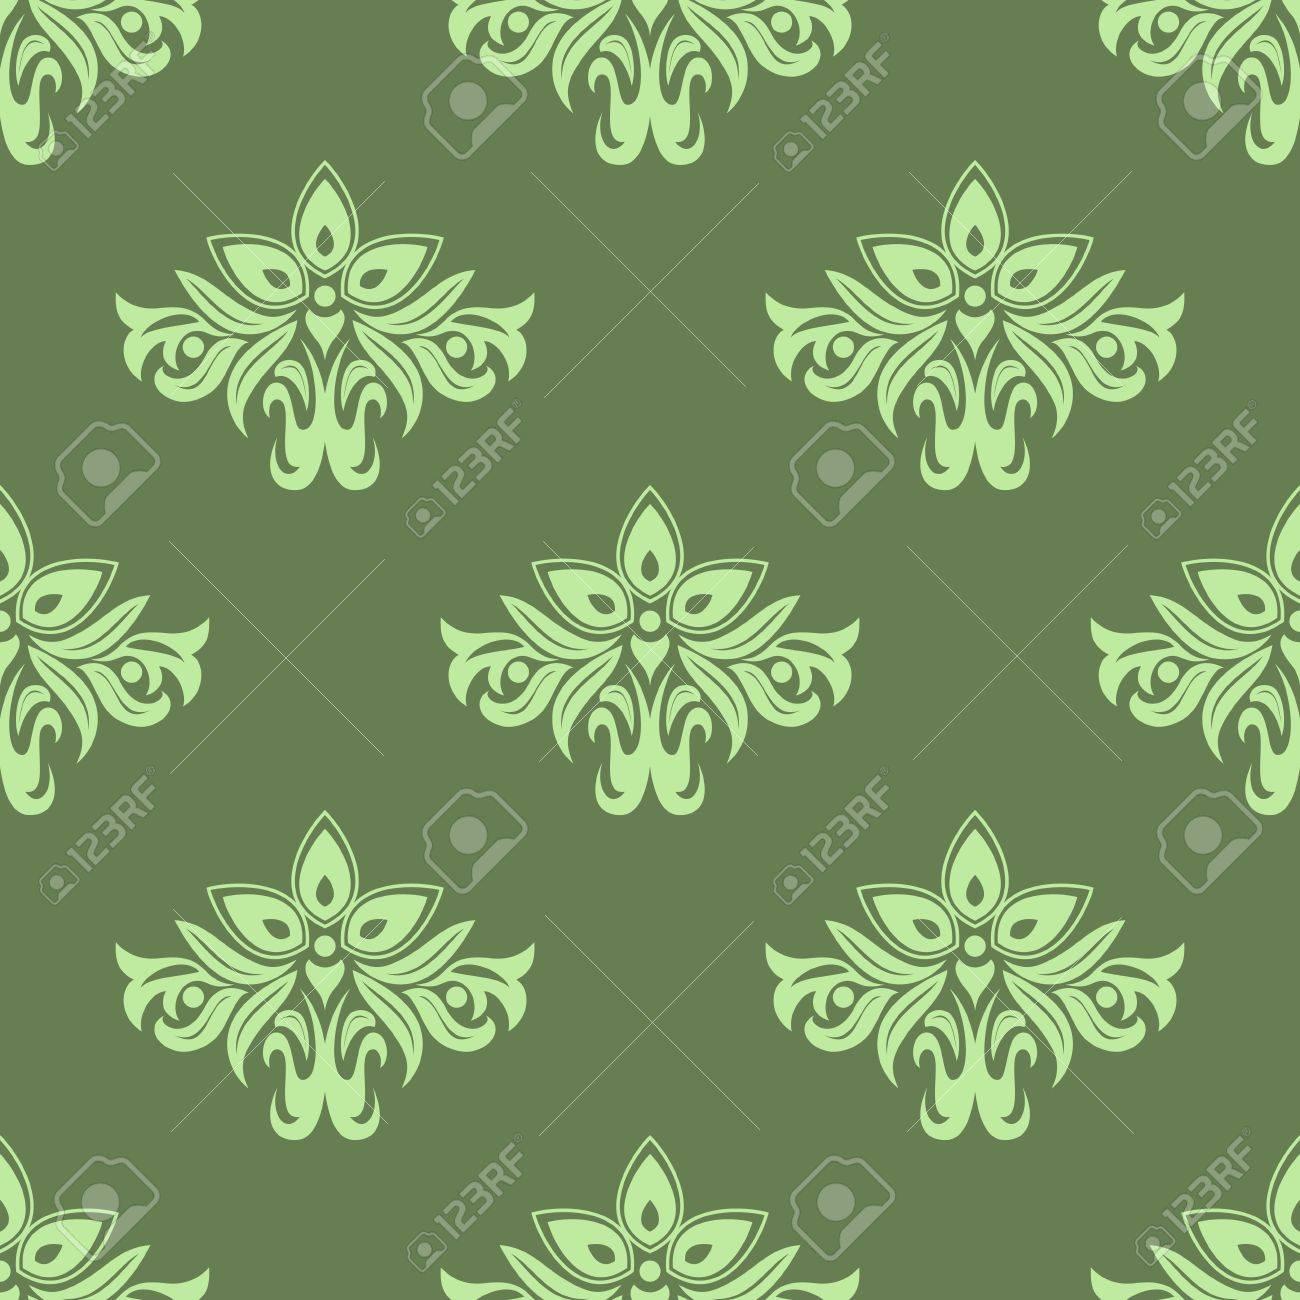 Light Green Floral Seamless Pattern On Dark Green Background